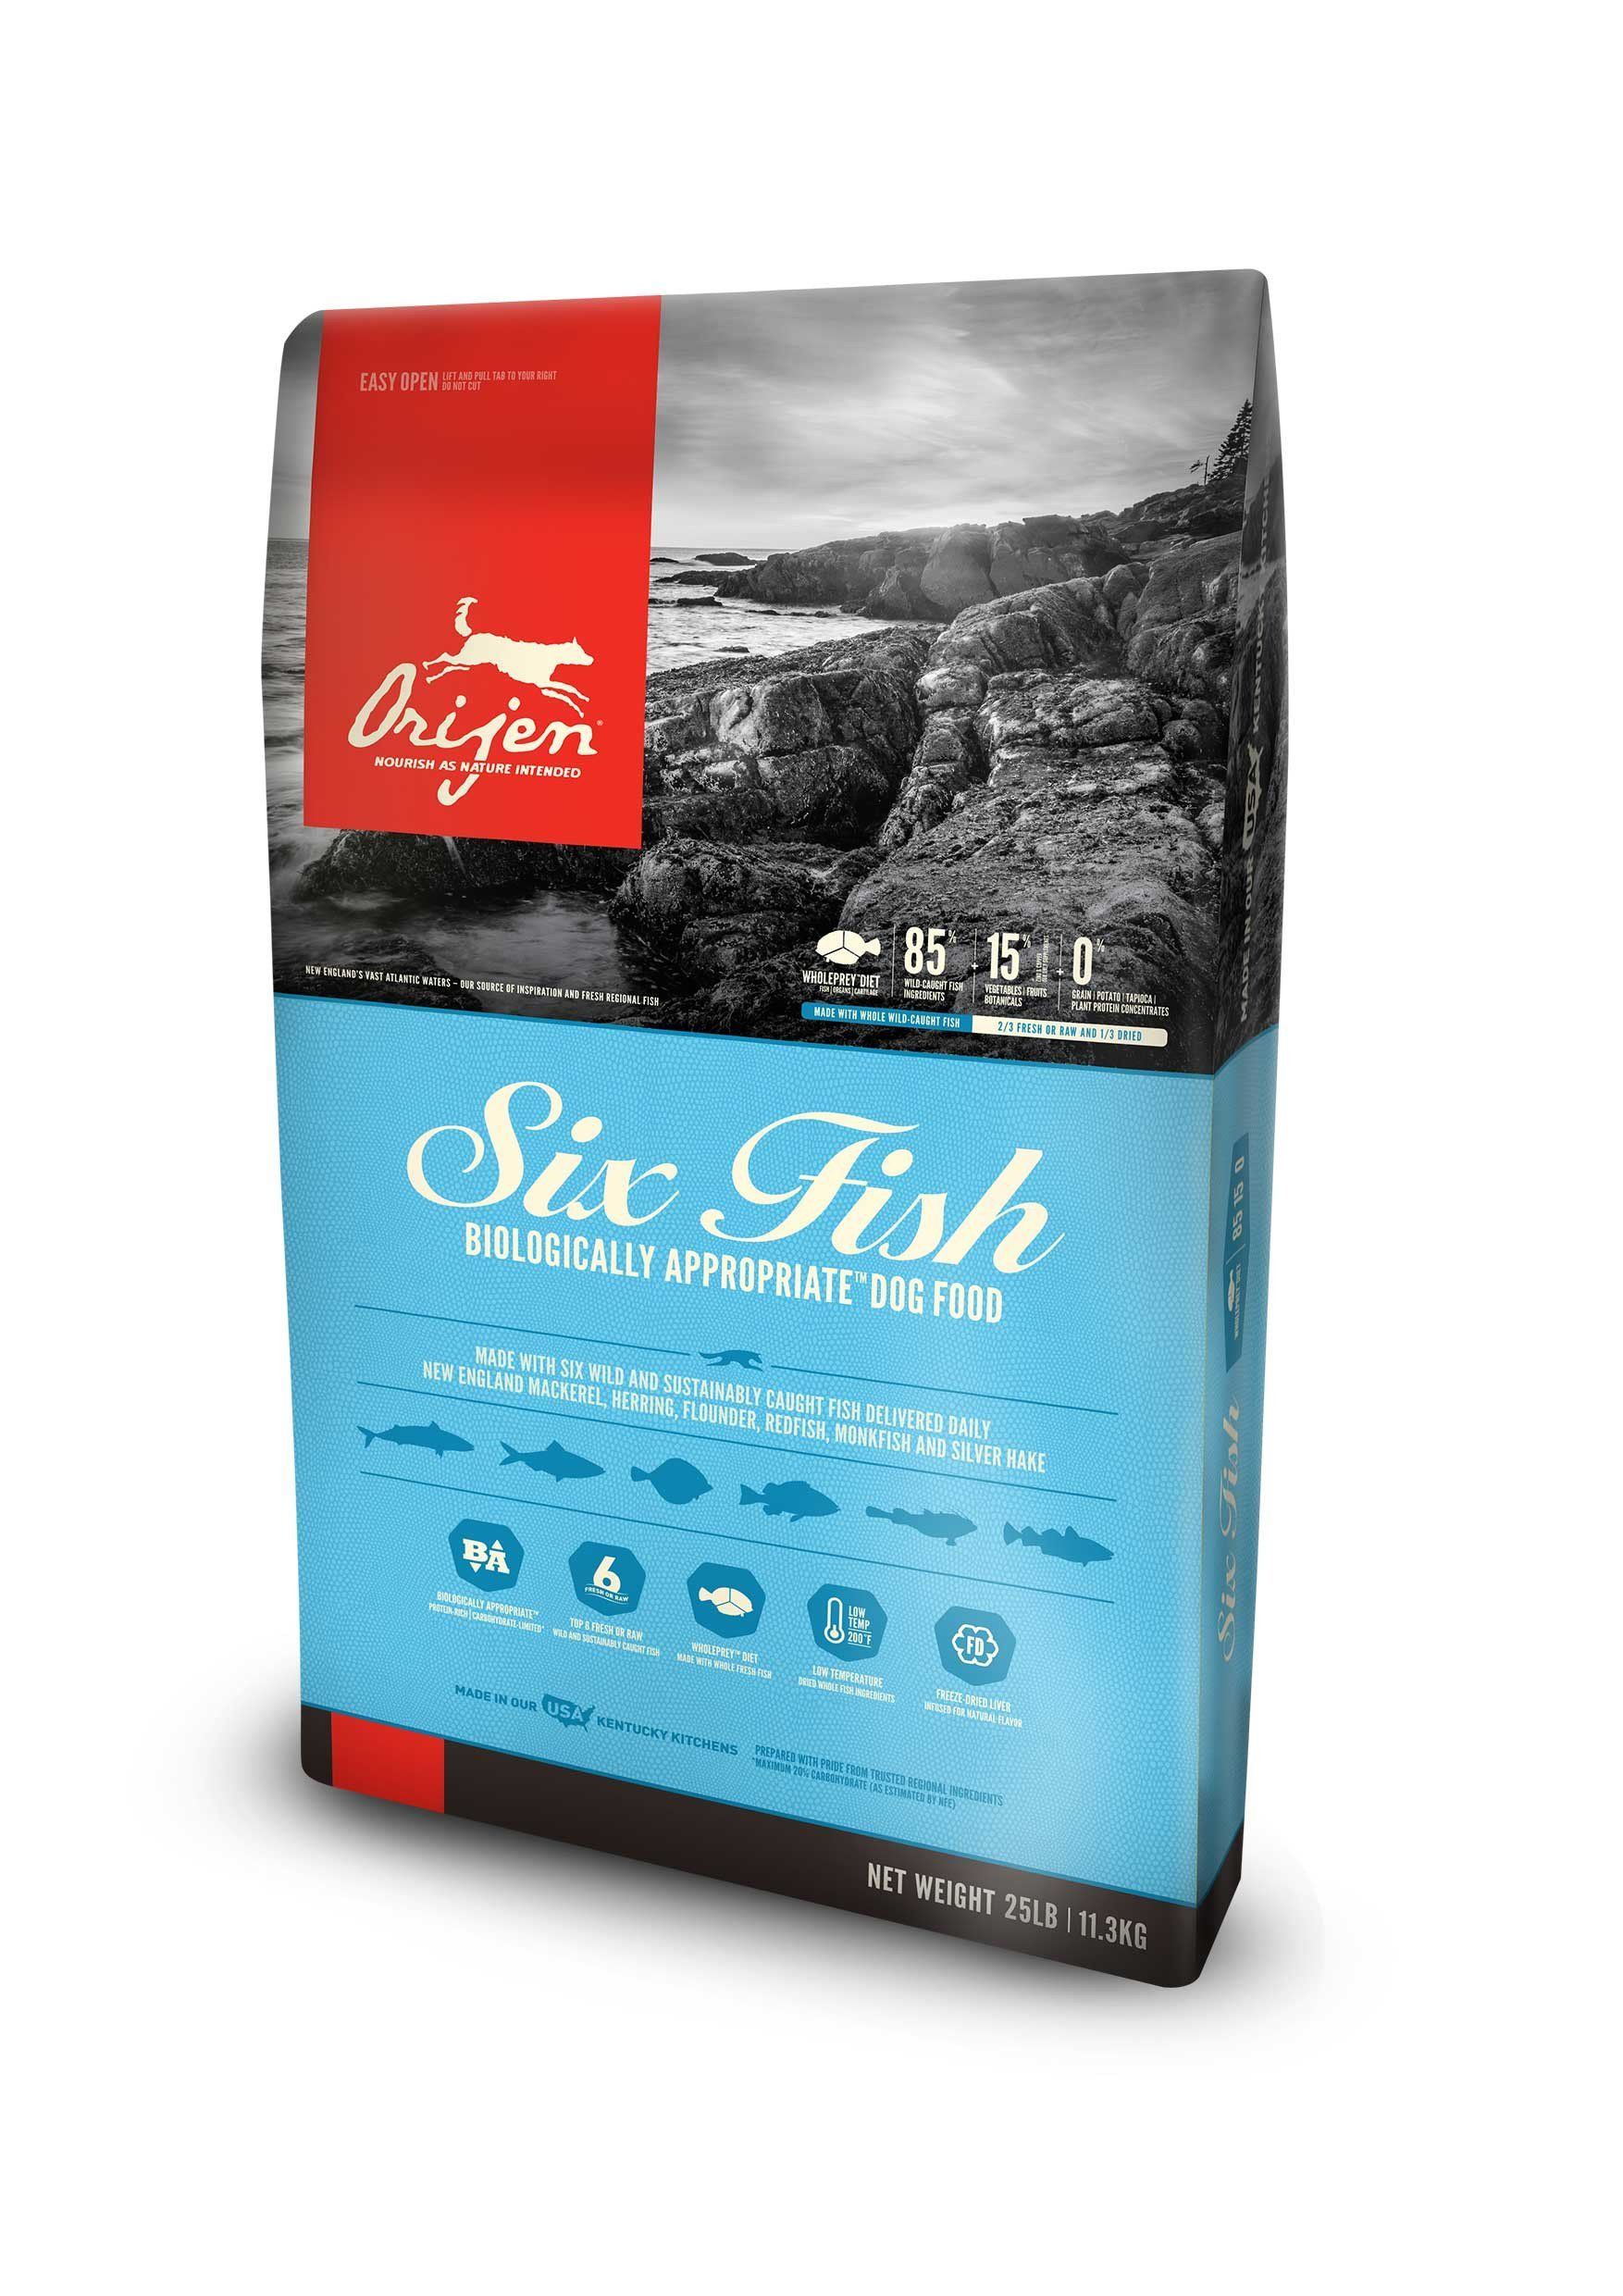 OrijenDog Food Six Fish Dry cat food, Dry dog food